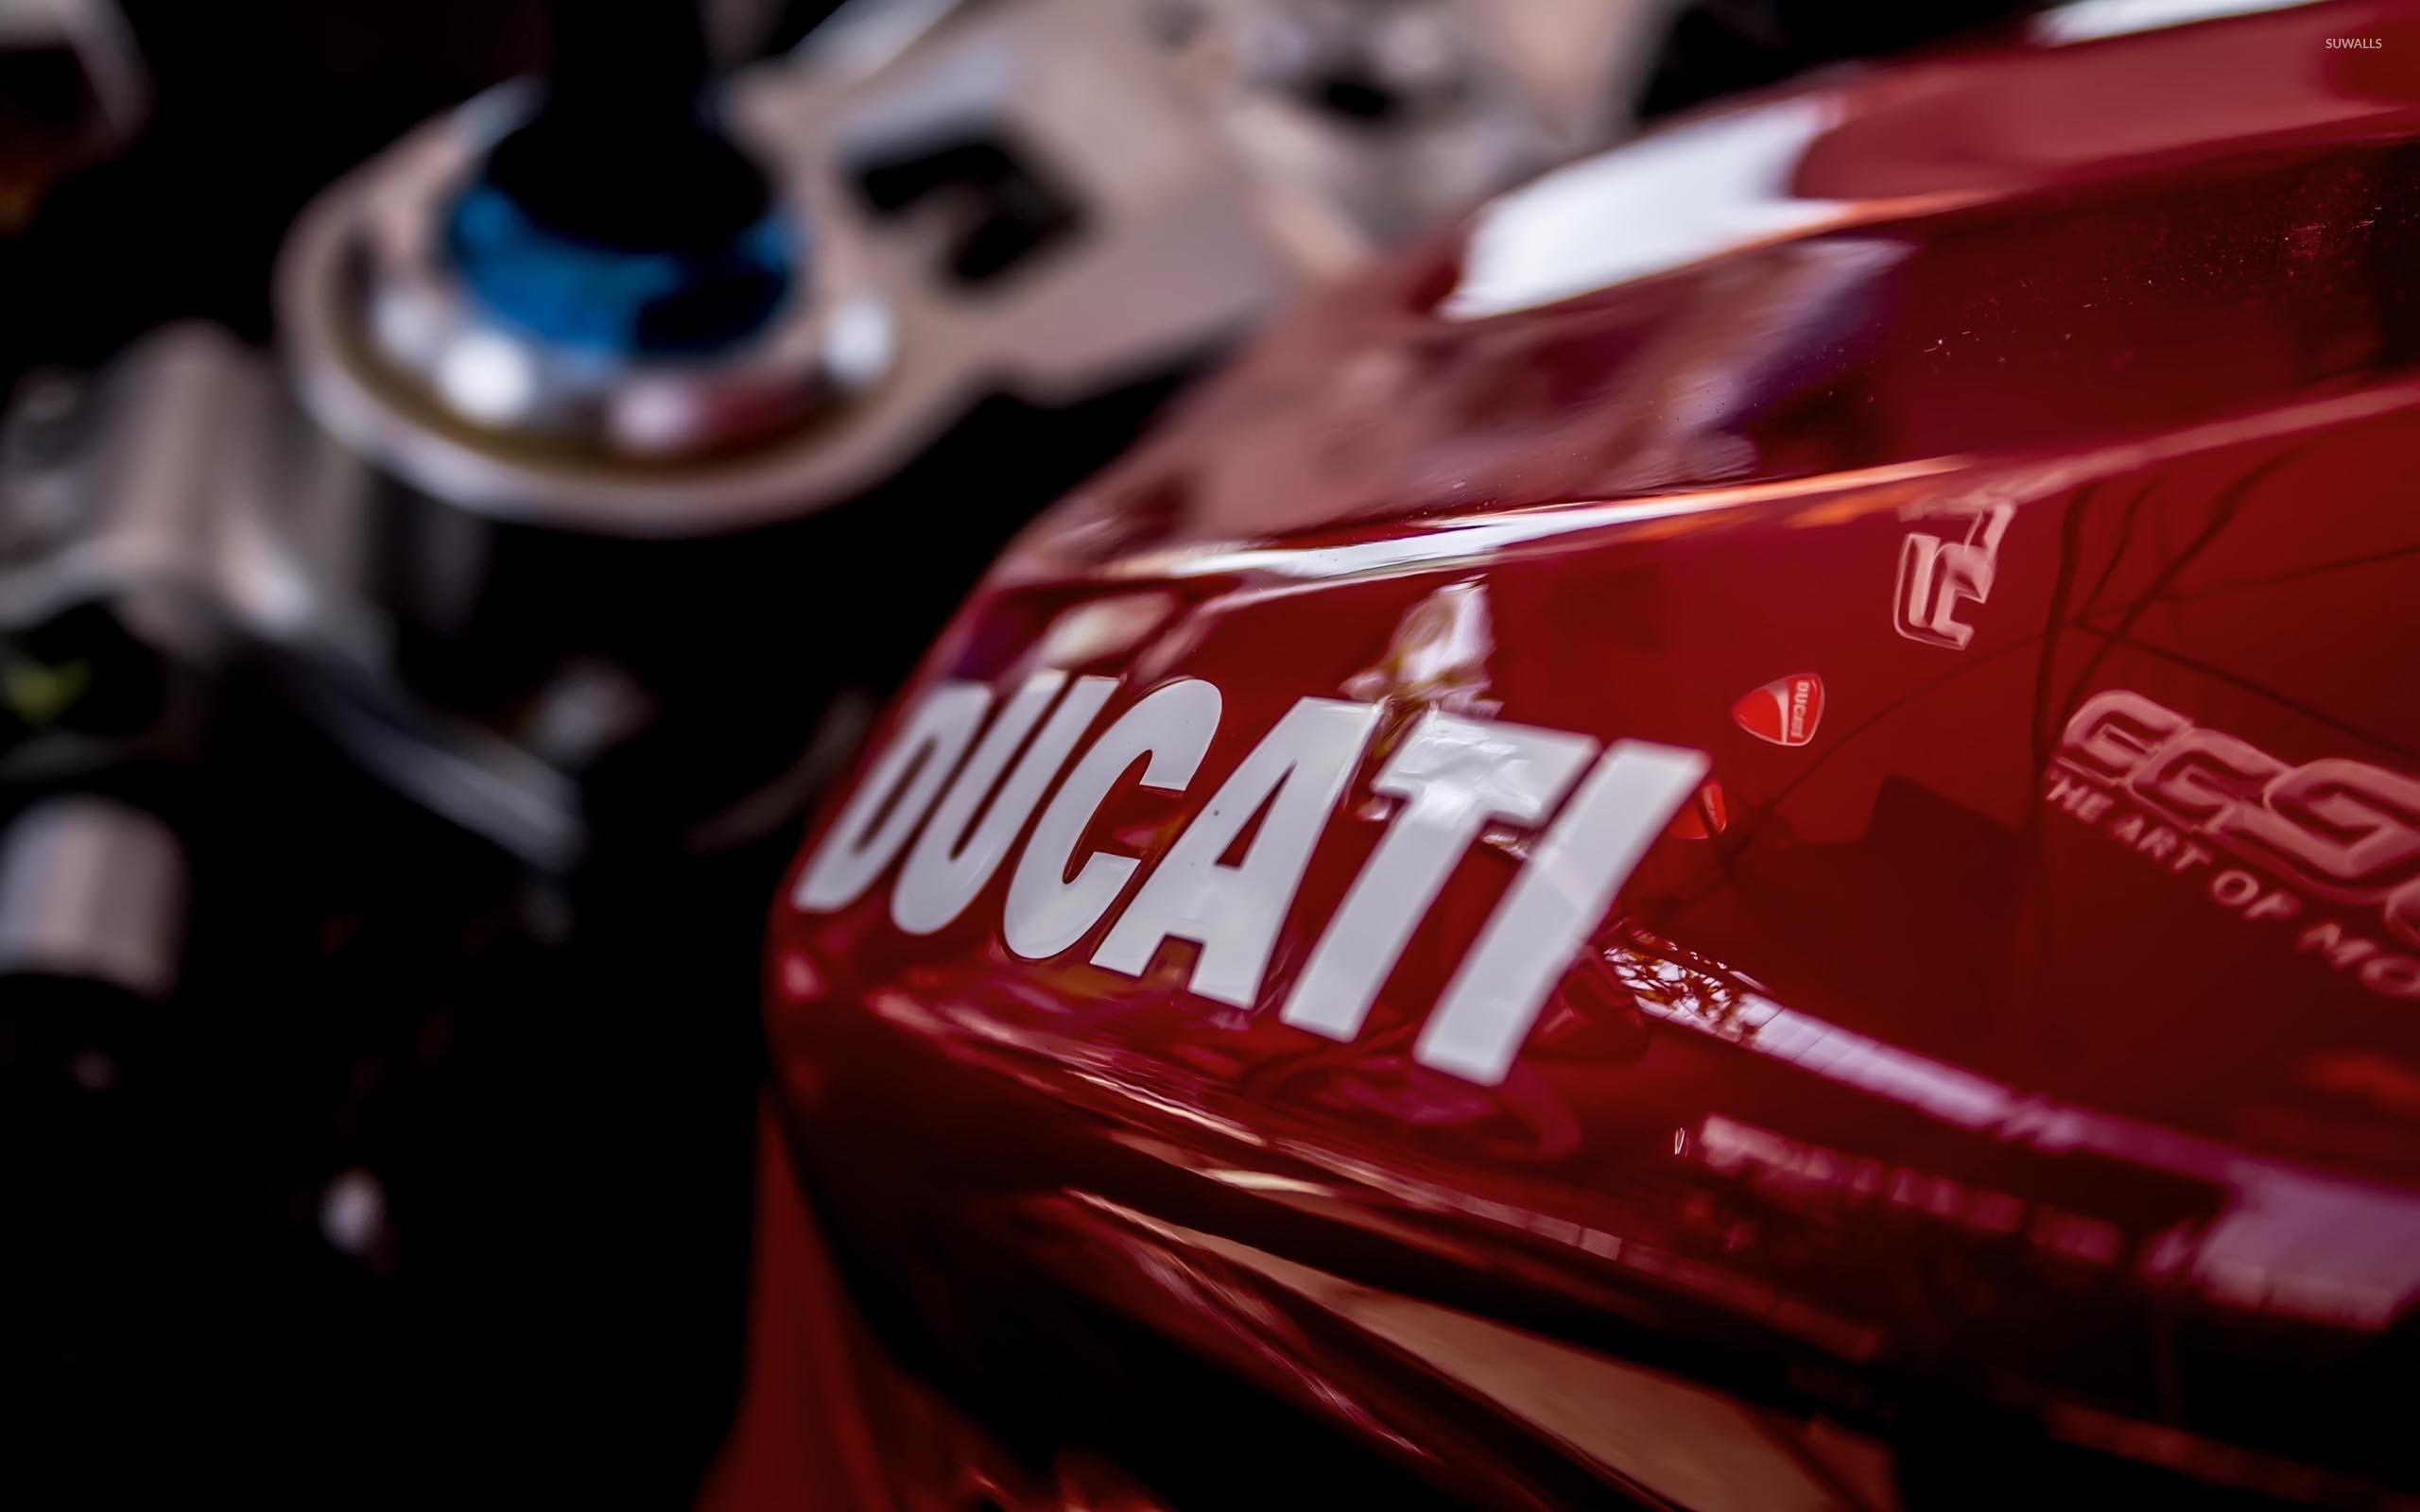 ducati-logo-23549-2560x1600.jpg